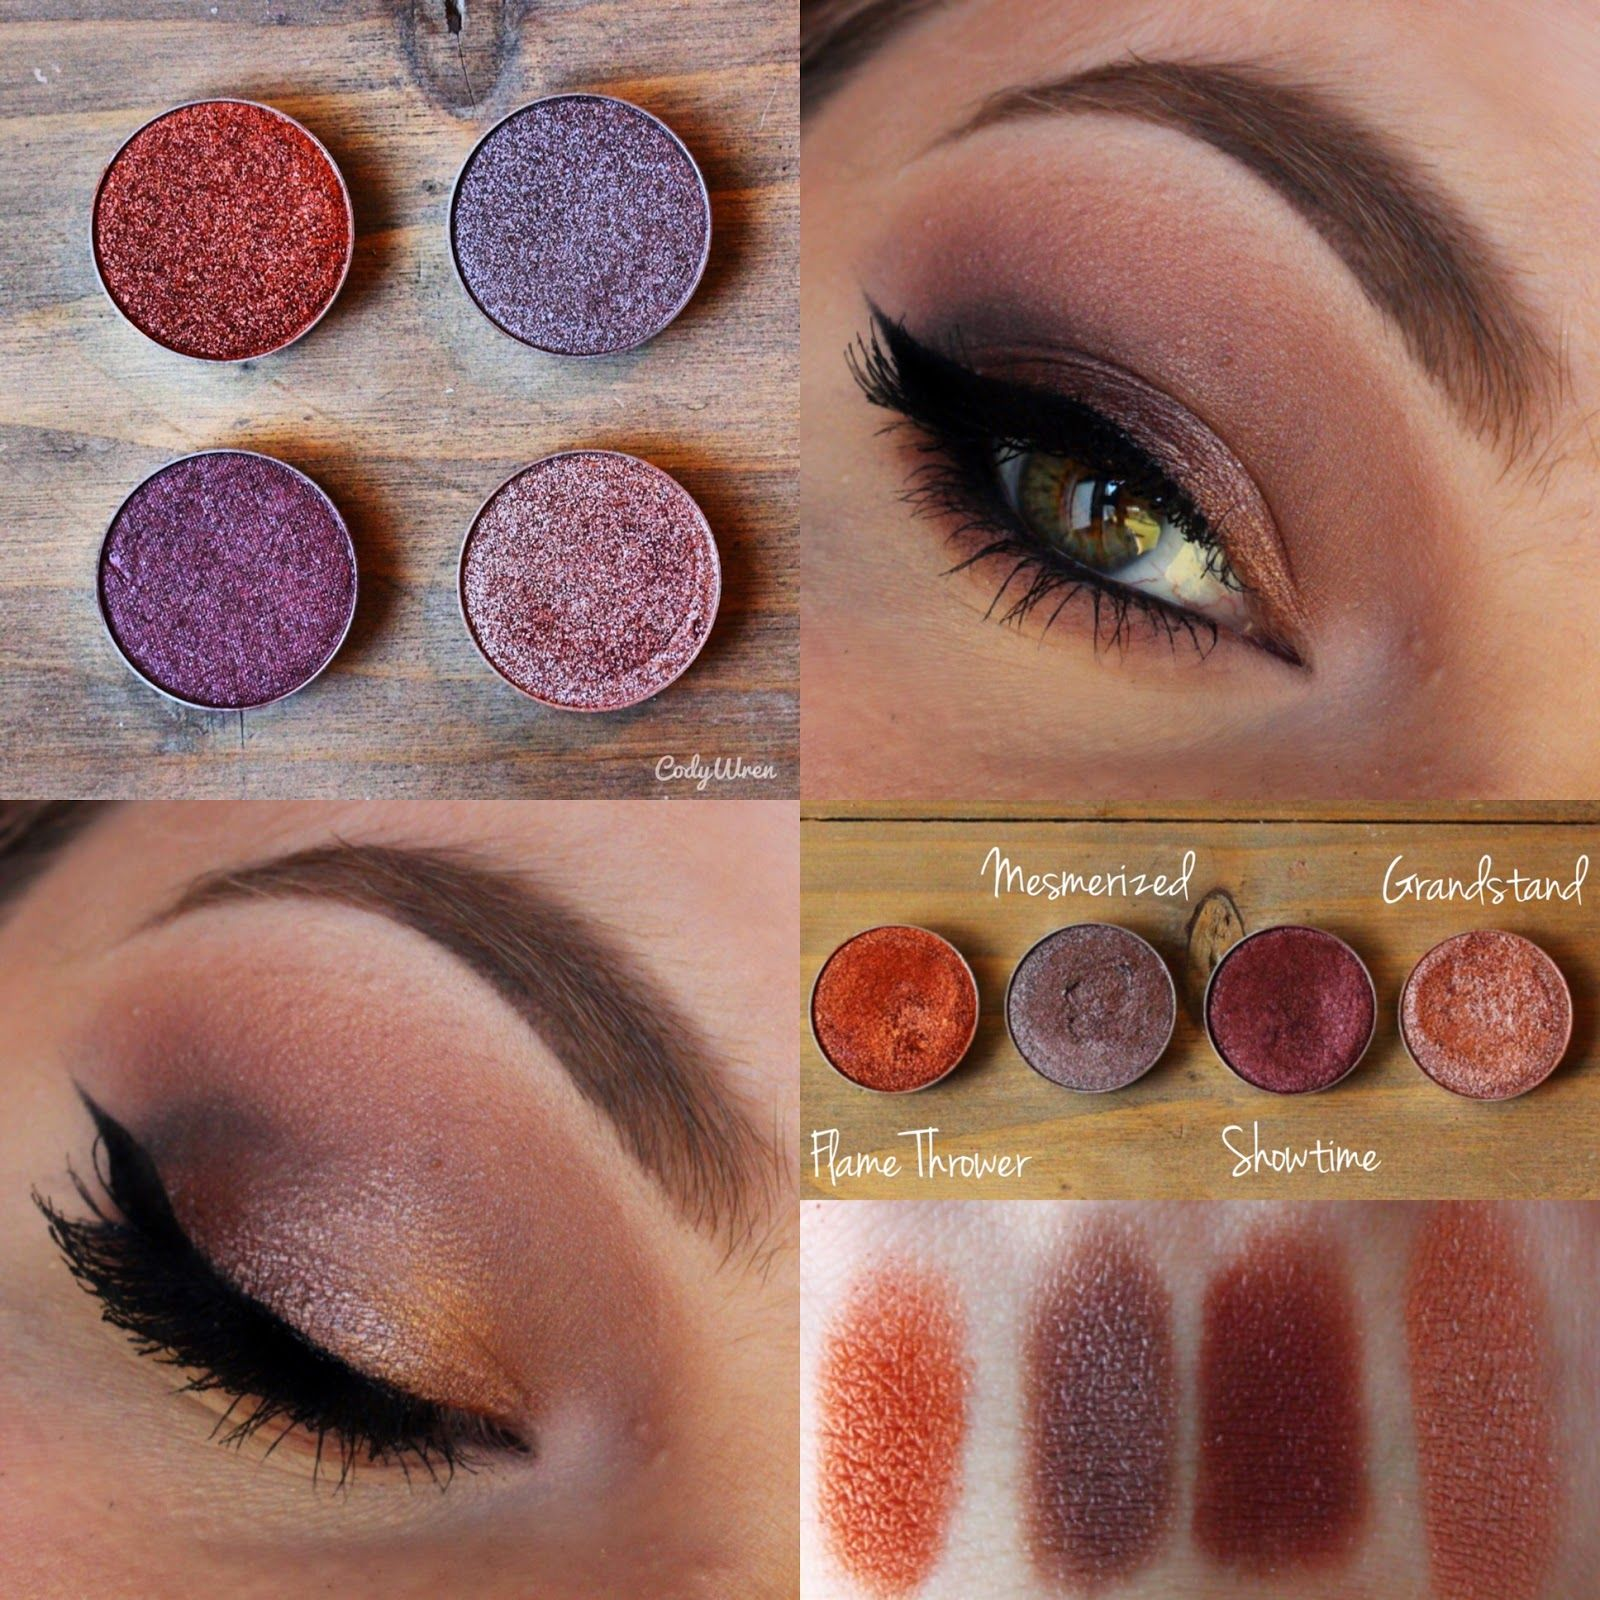 #codywren www.codywren.me Makeup Geek Cosmetics Foiled Shadows {Review & Swatches}.